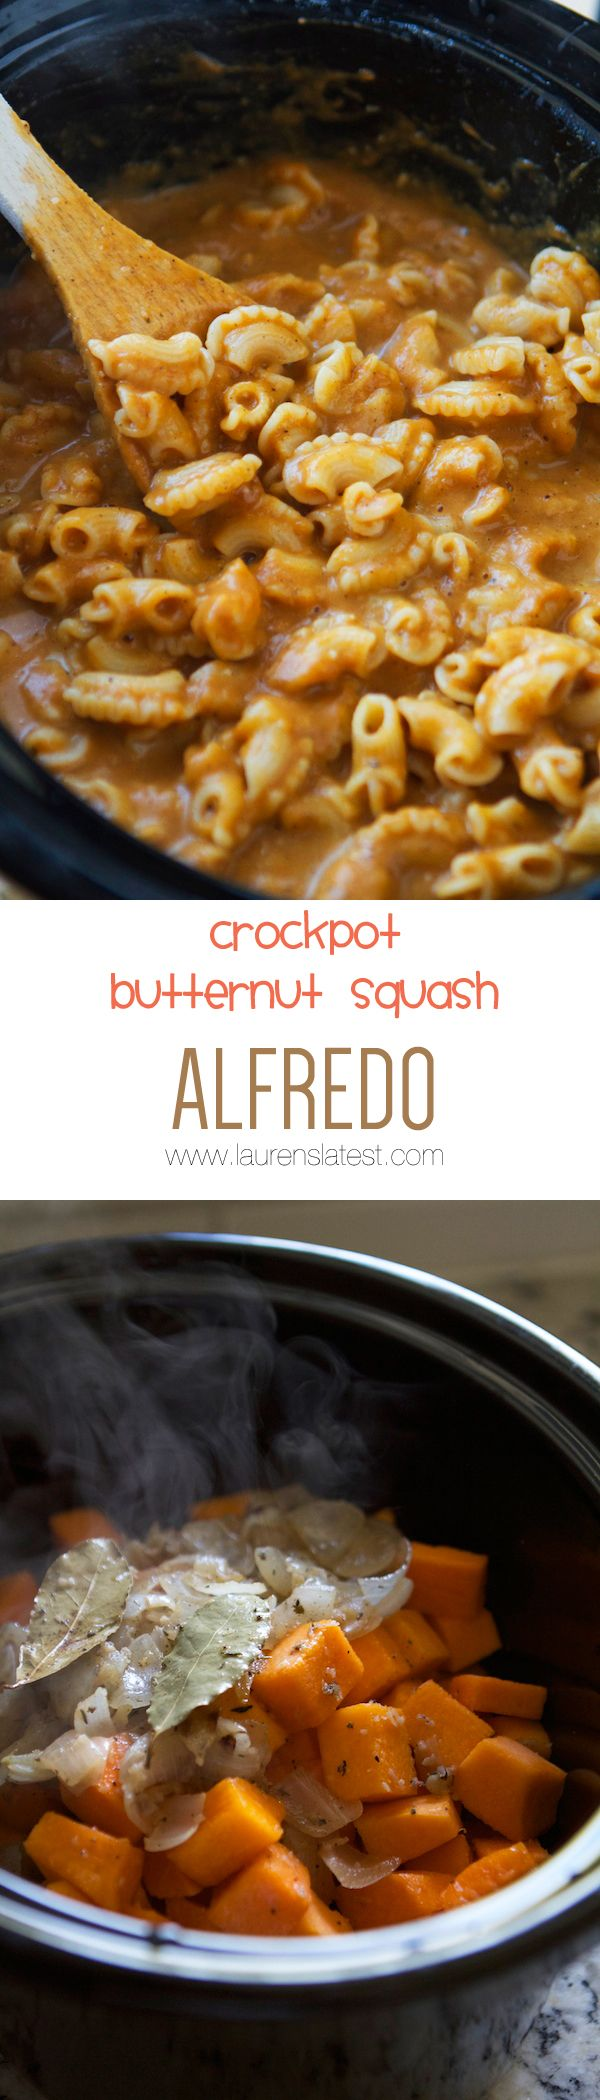 Crockpot Butternut Squash Alfredo....sweet, creamy, cheesy and OMG so so so EASY!